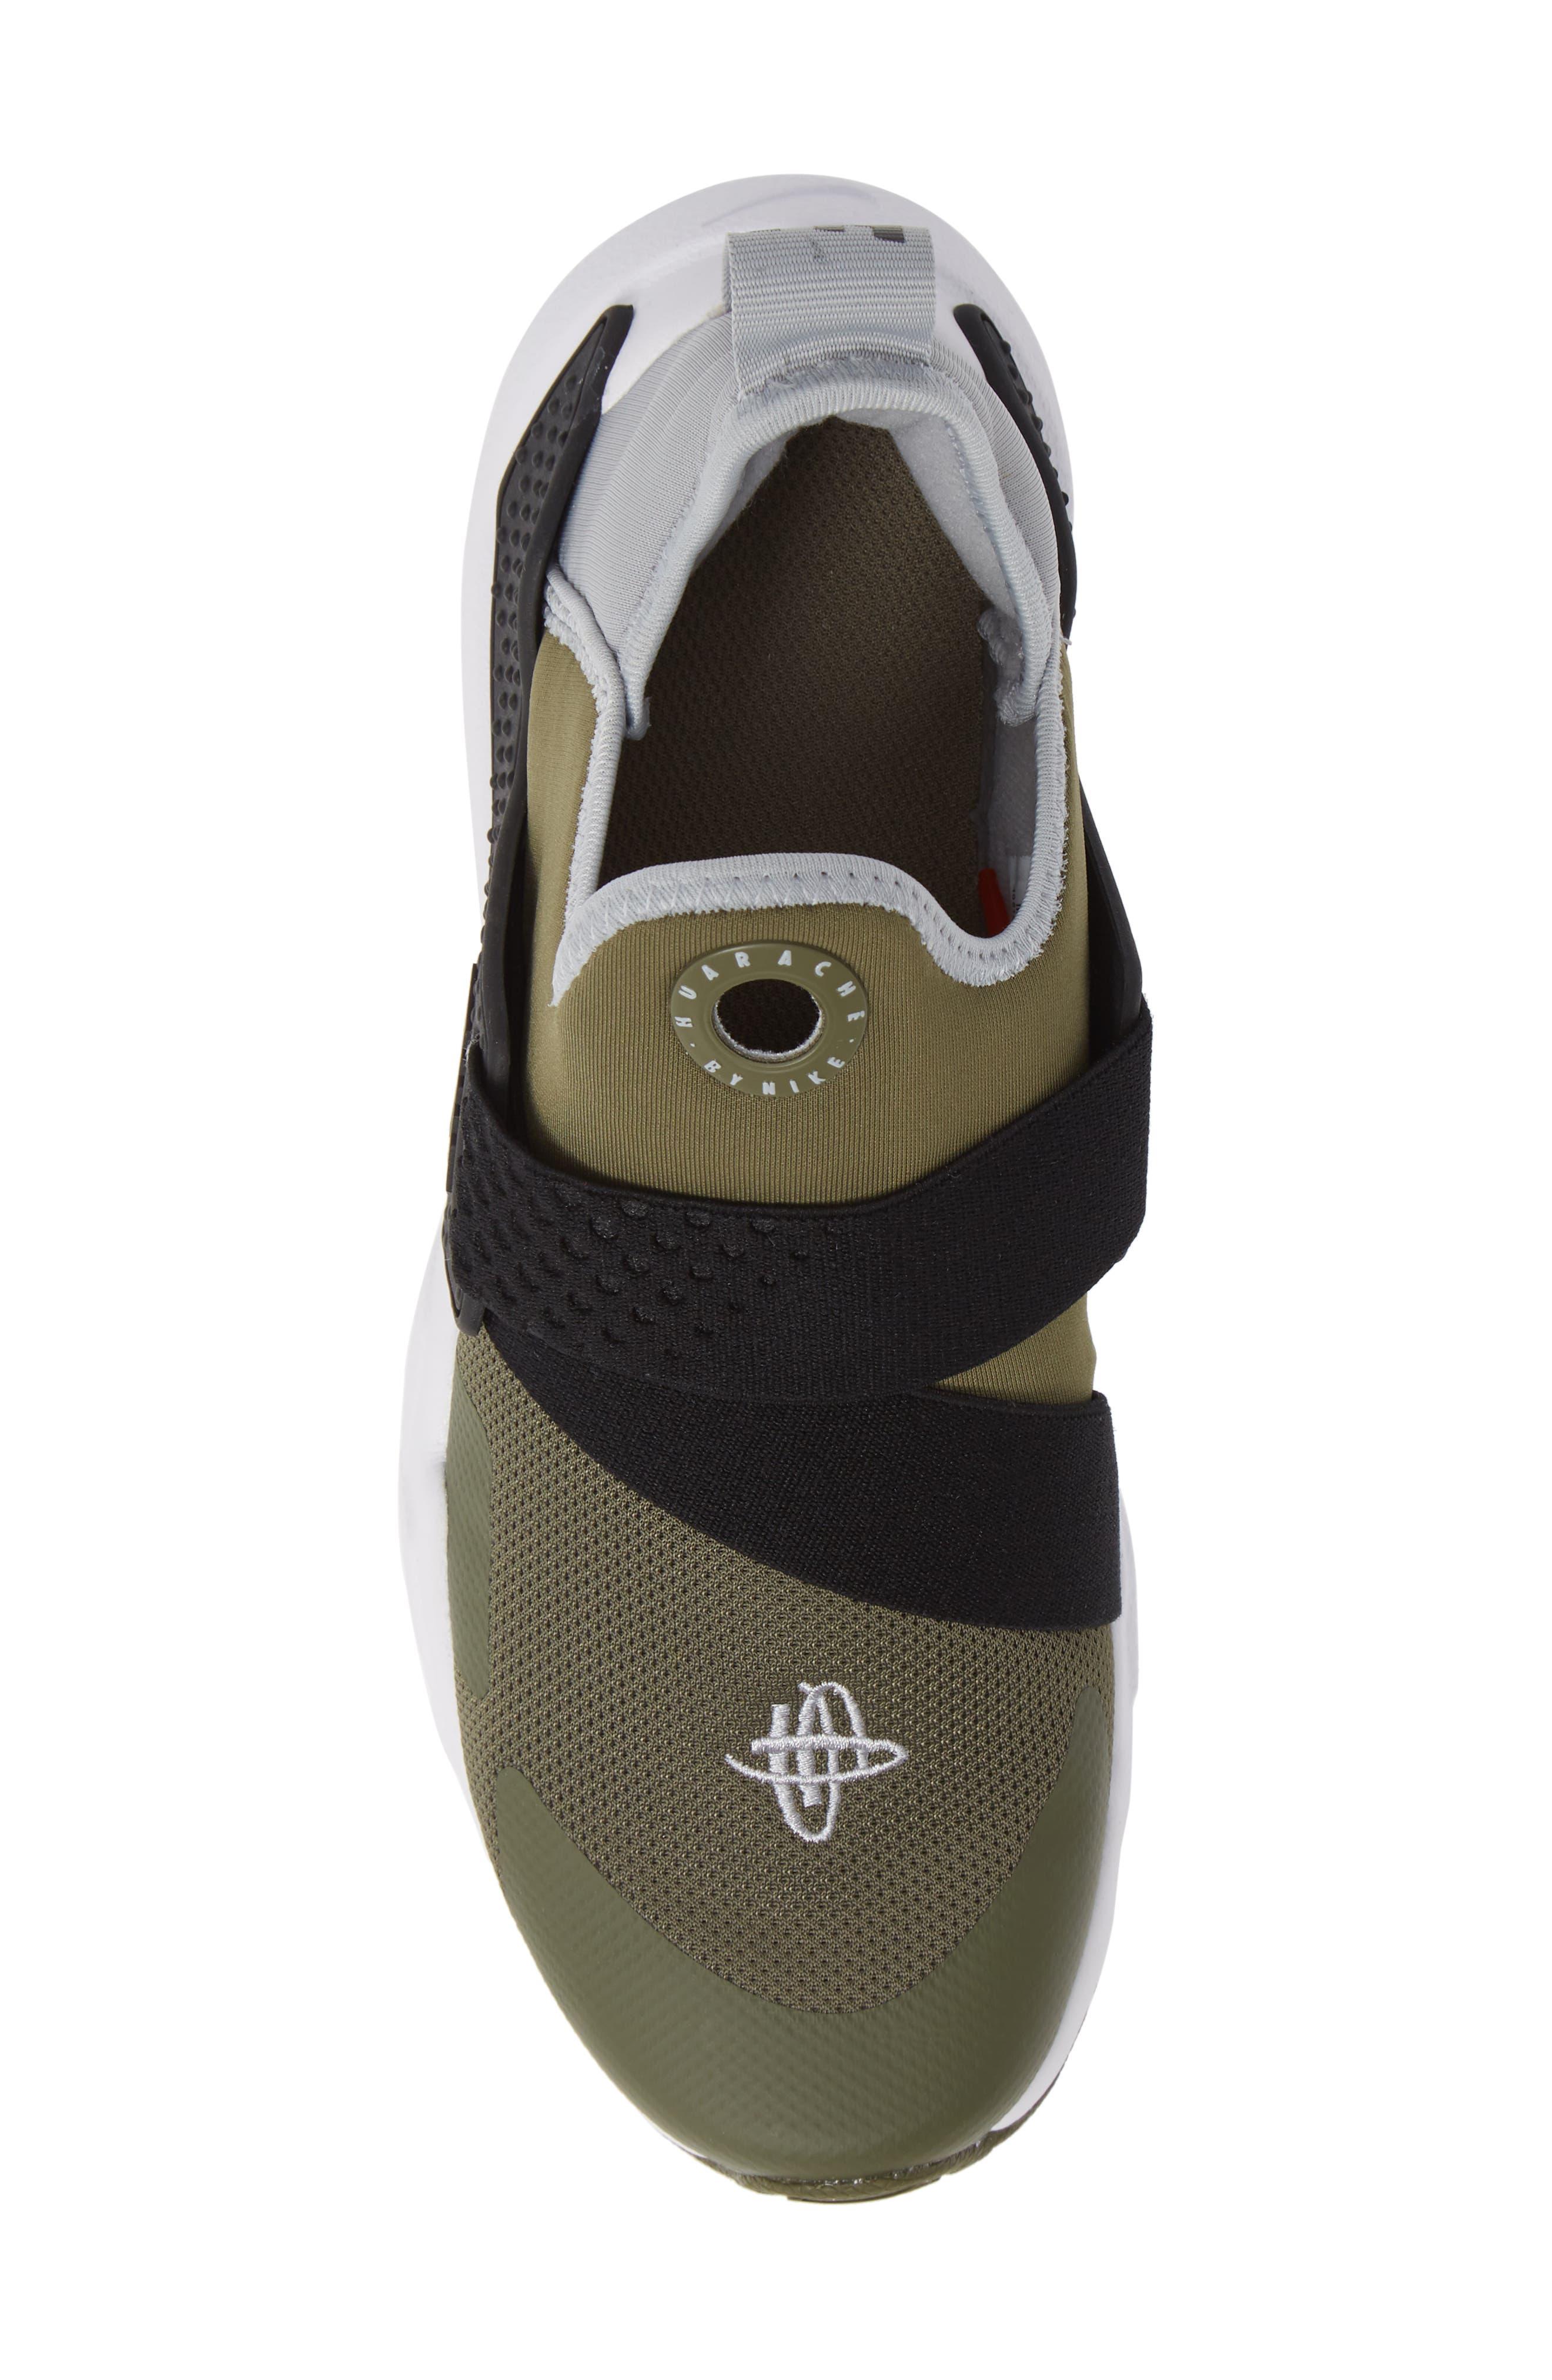 Huarache Extreme Sneaker,                             Alternate thumbnail 4, color,                             Olive/ Wolf Grey/ Black/ White